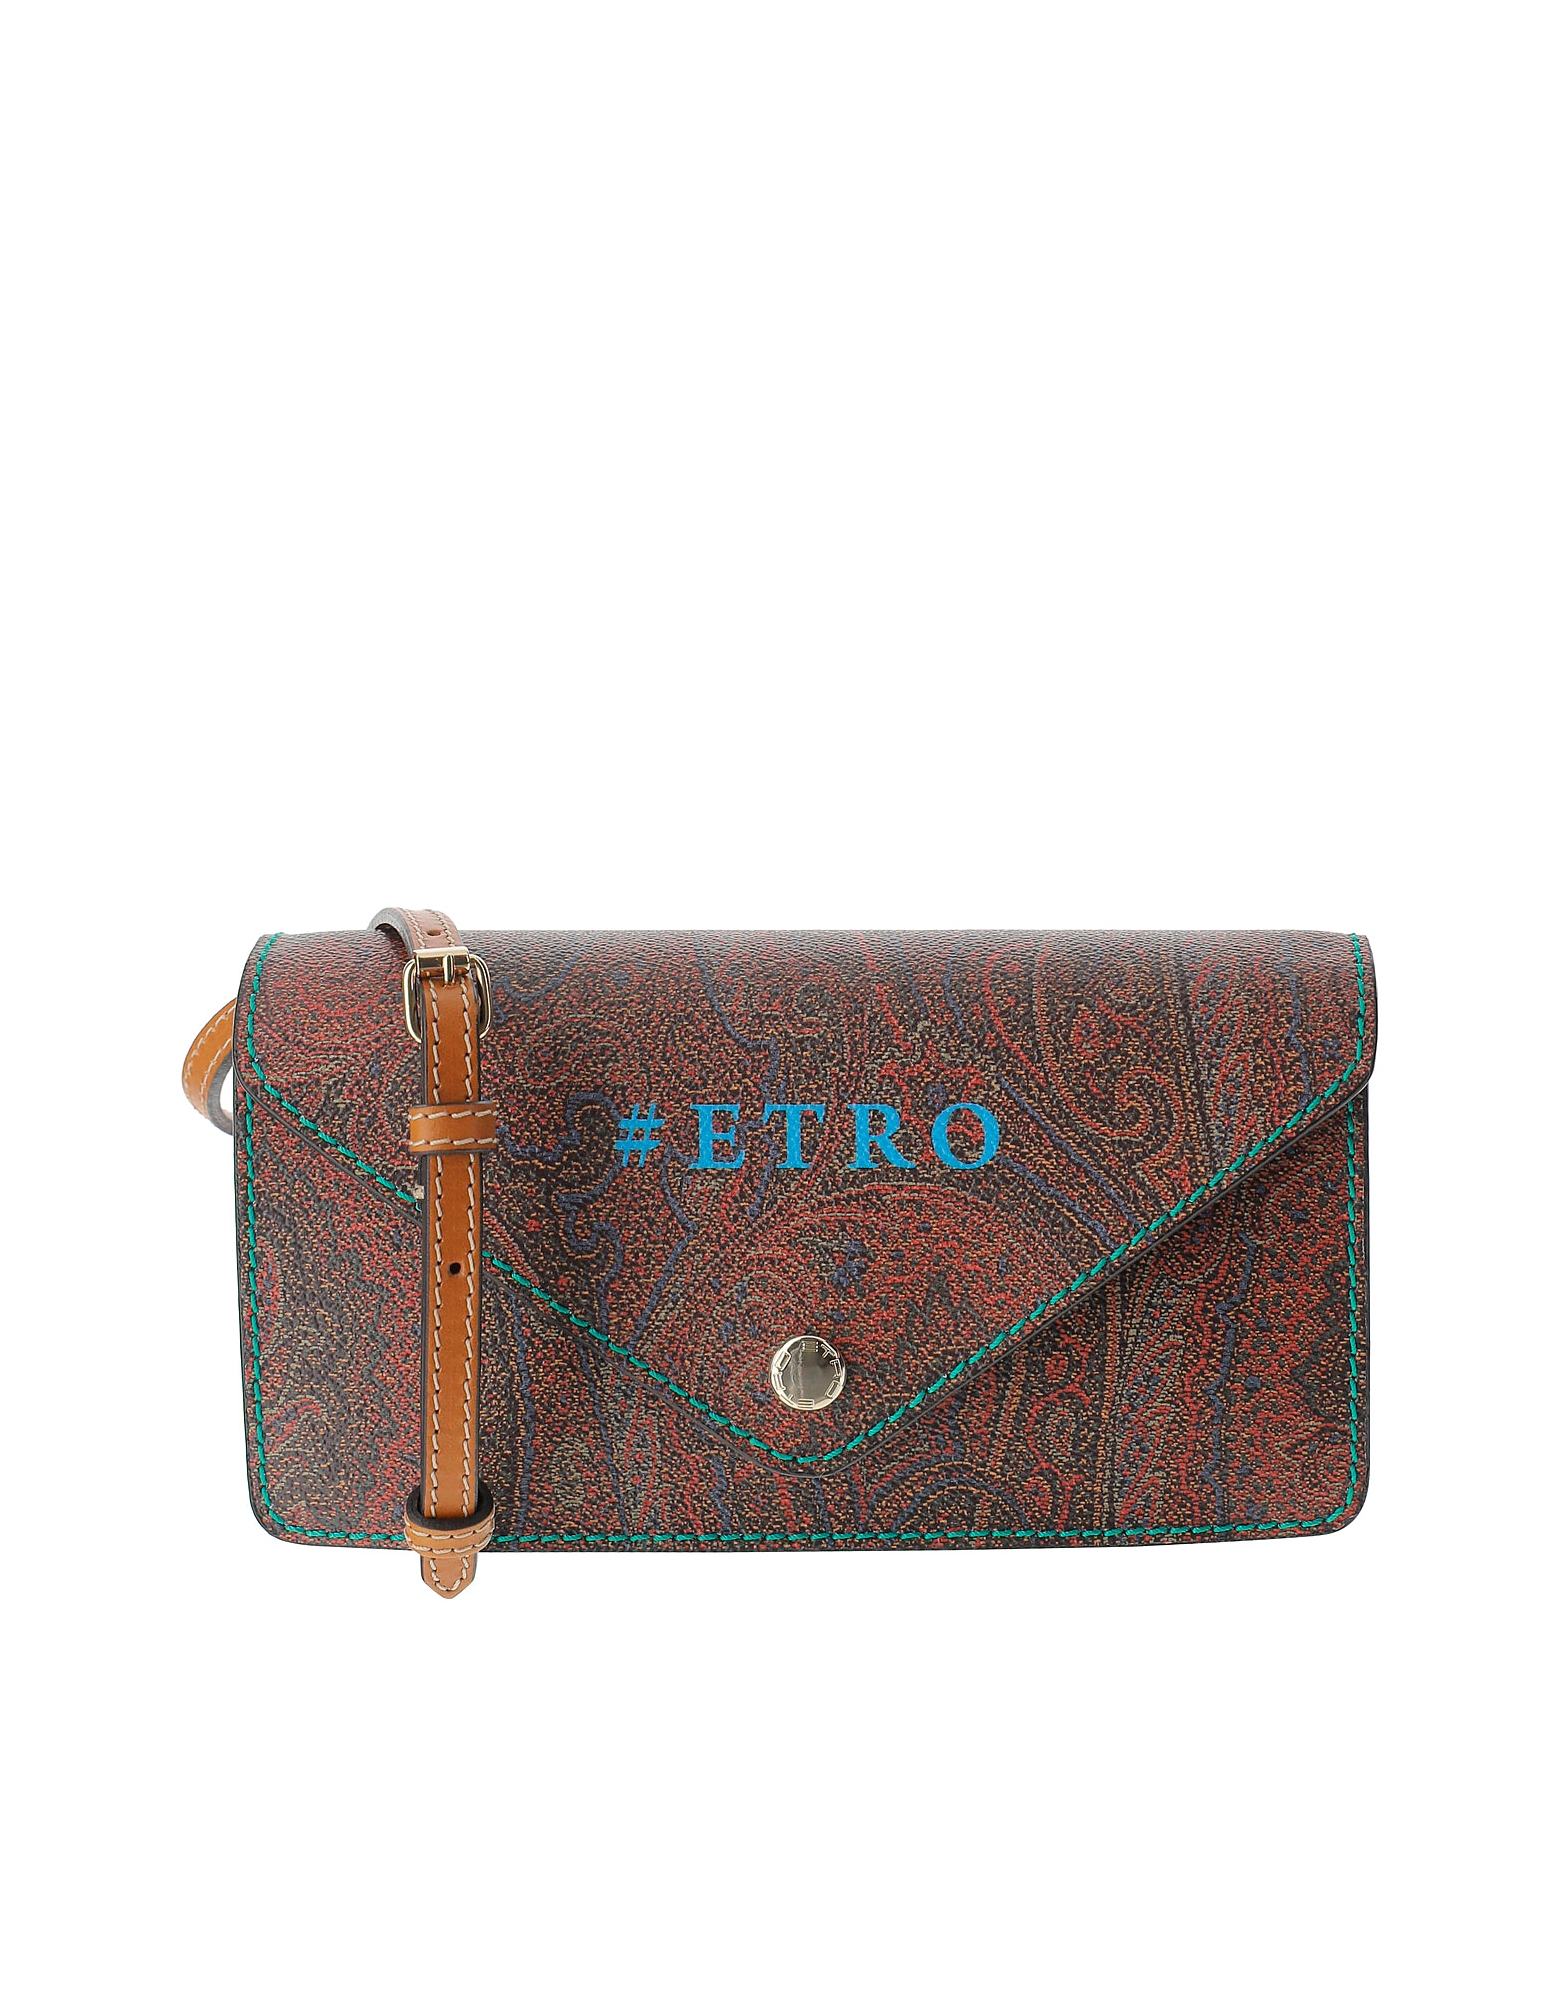 Etro Designer Handbags, Paisley Jacquard Canvas Flap Front Crossbody Bag